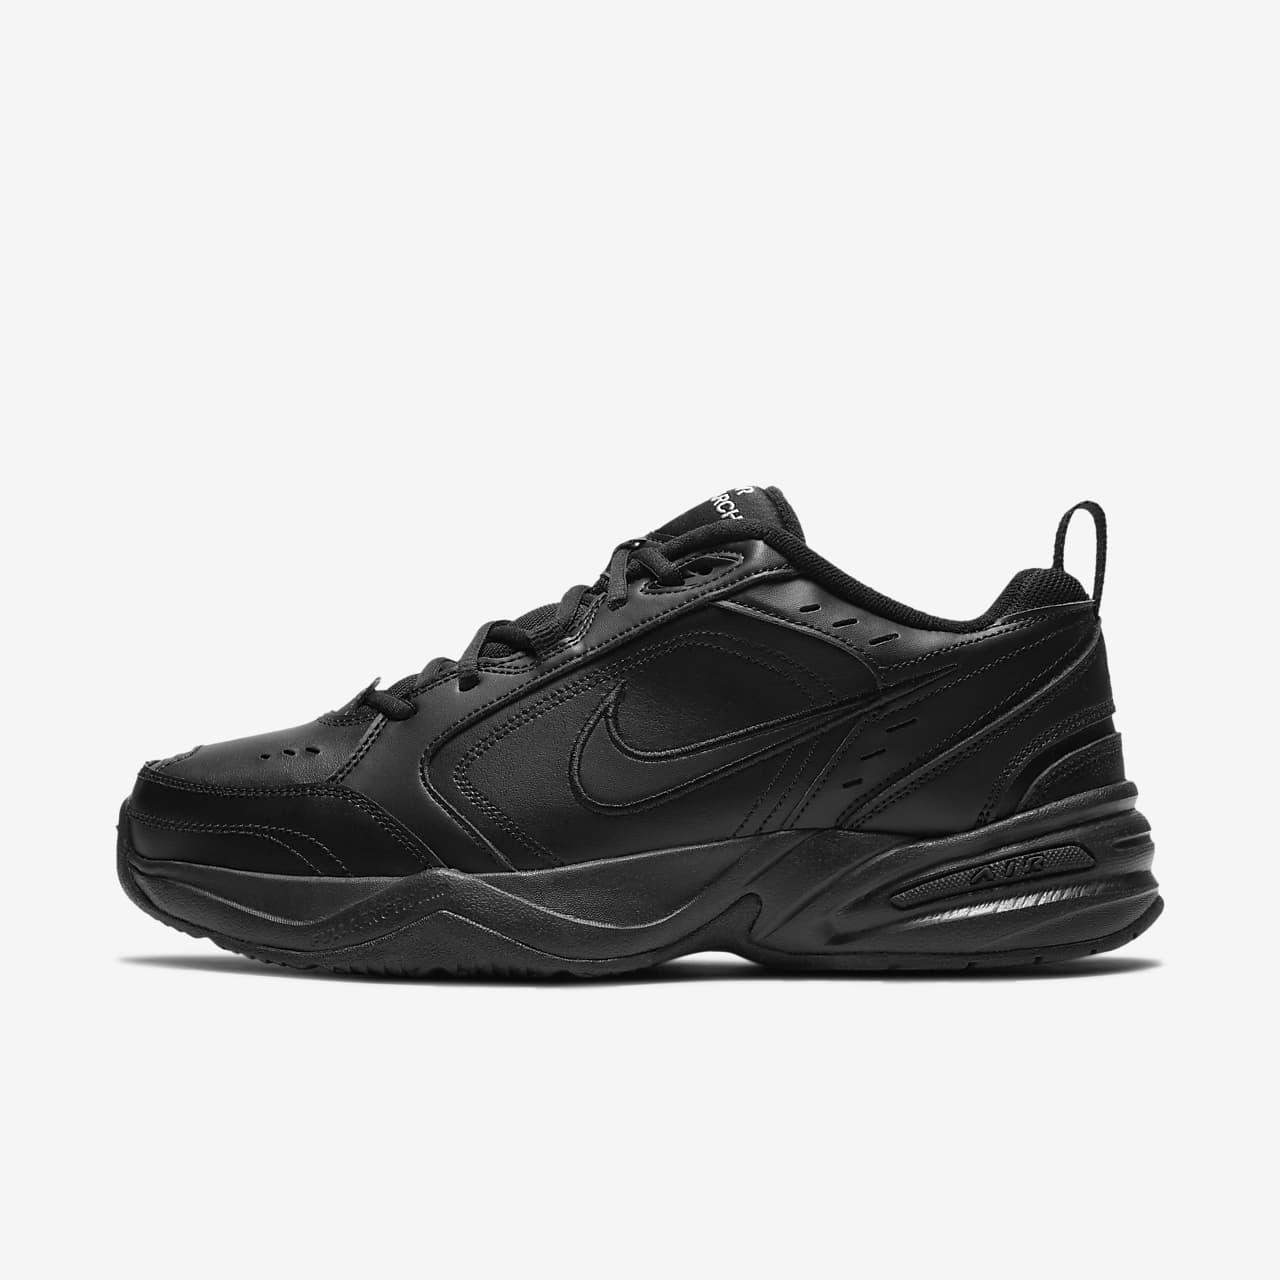 Calzado de gimnasio y lifestyle Nike Air Monarch IV